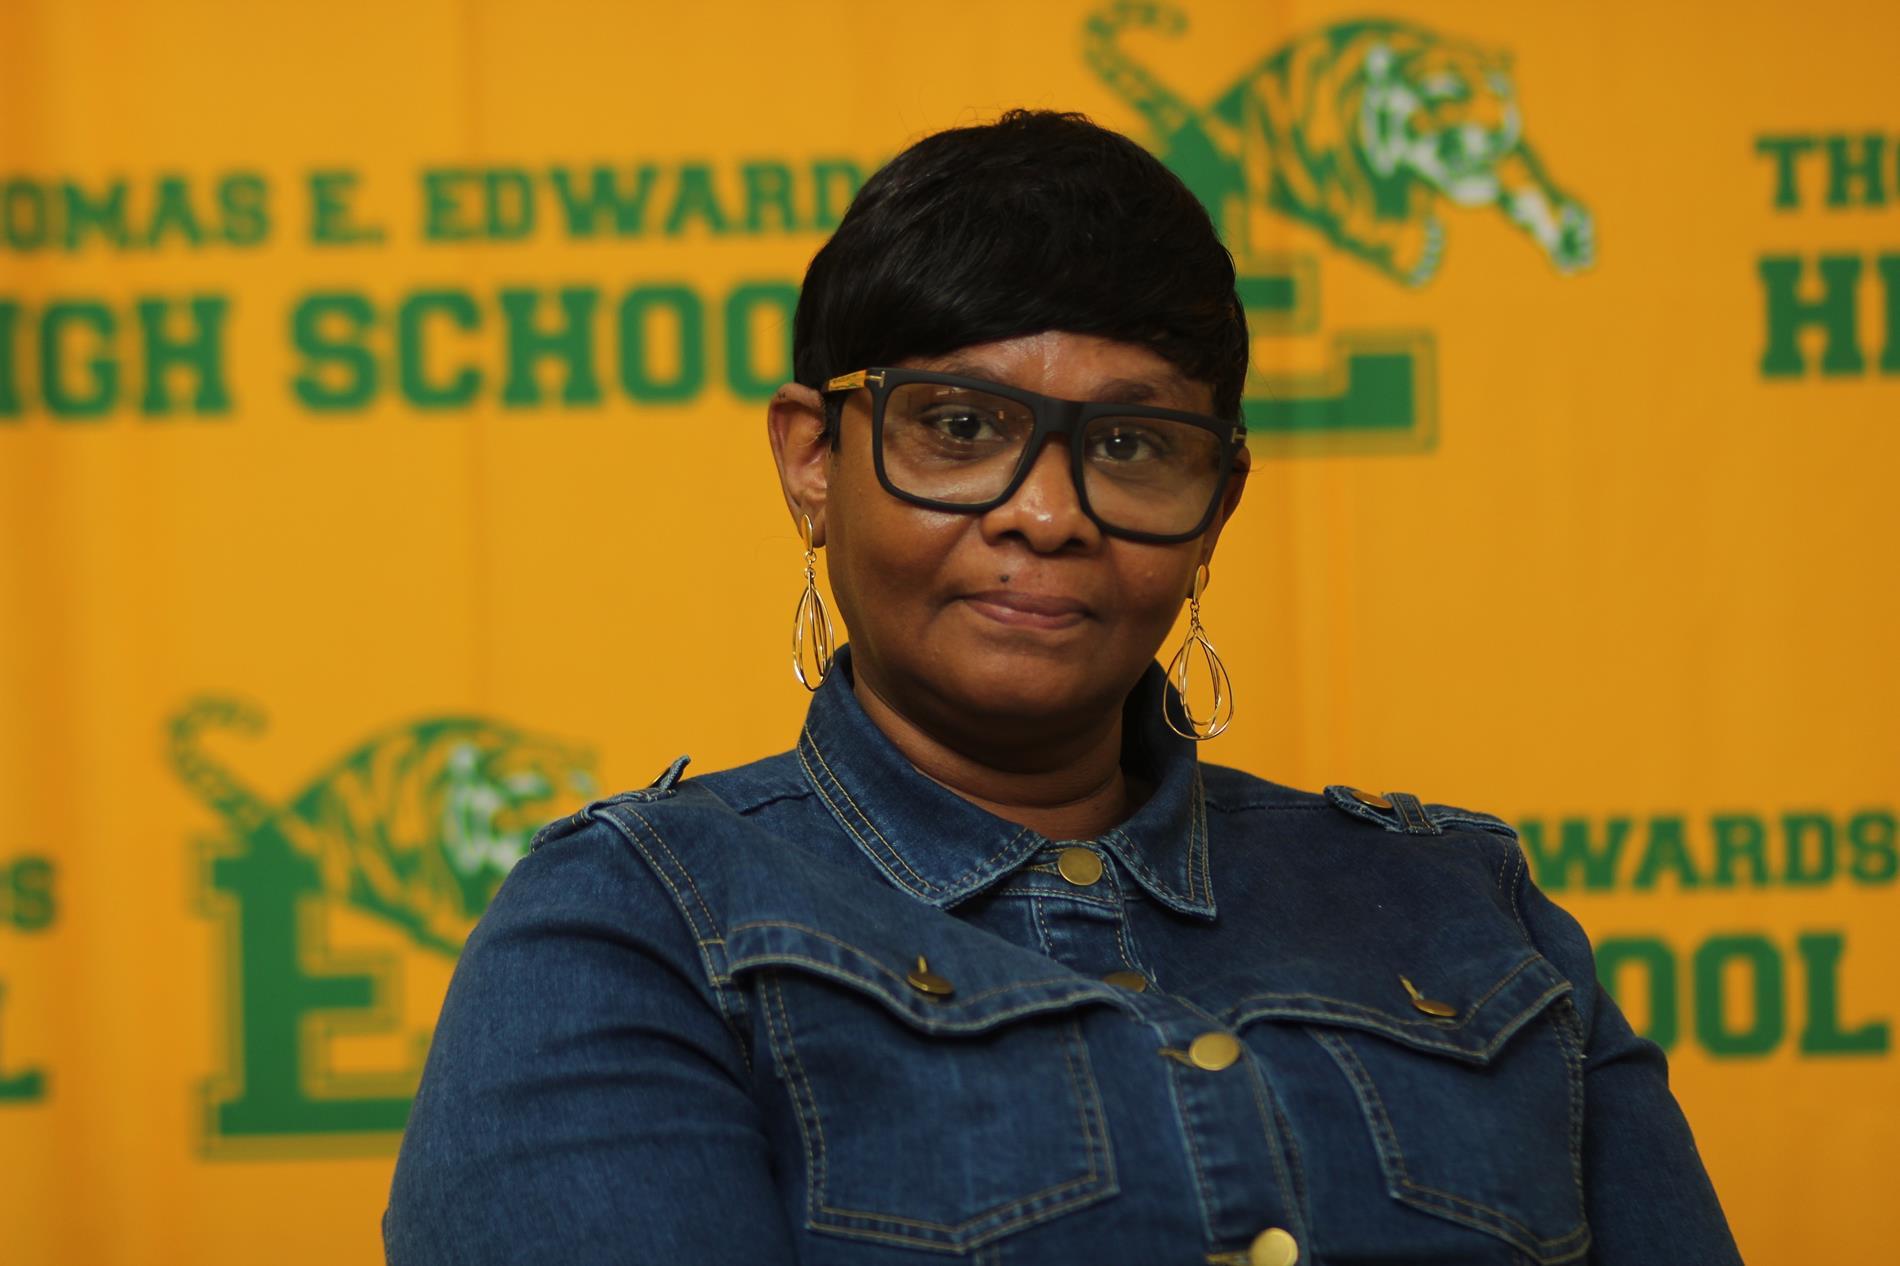 TEHS Teacher of the Year : Harriet Stancill